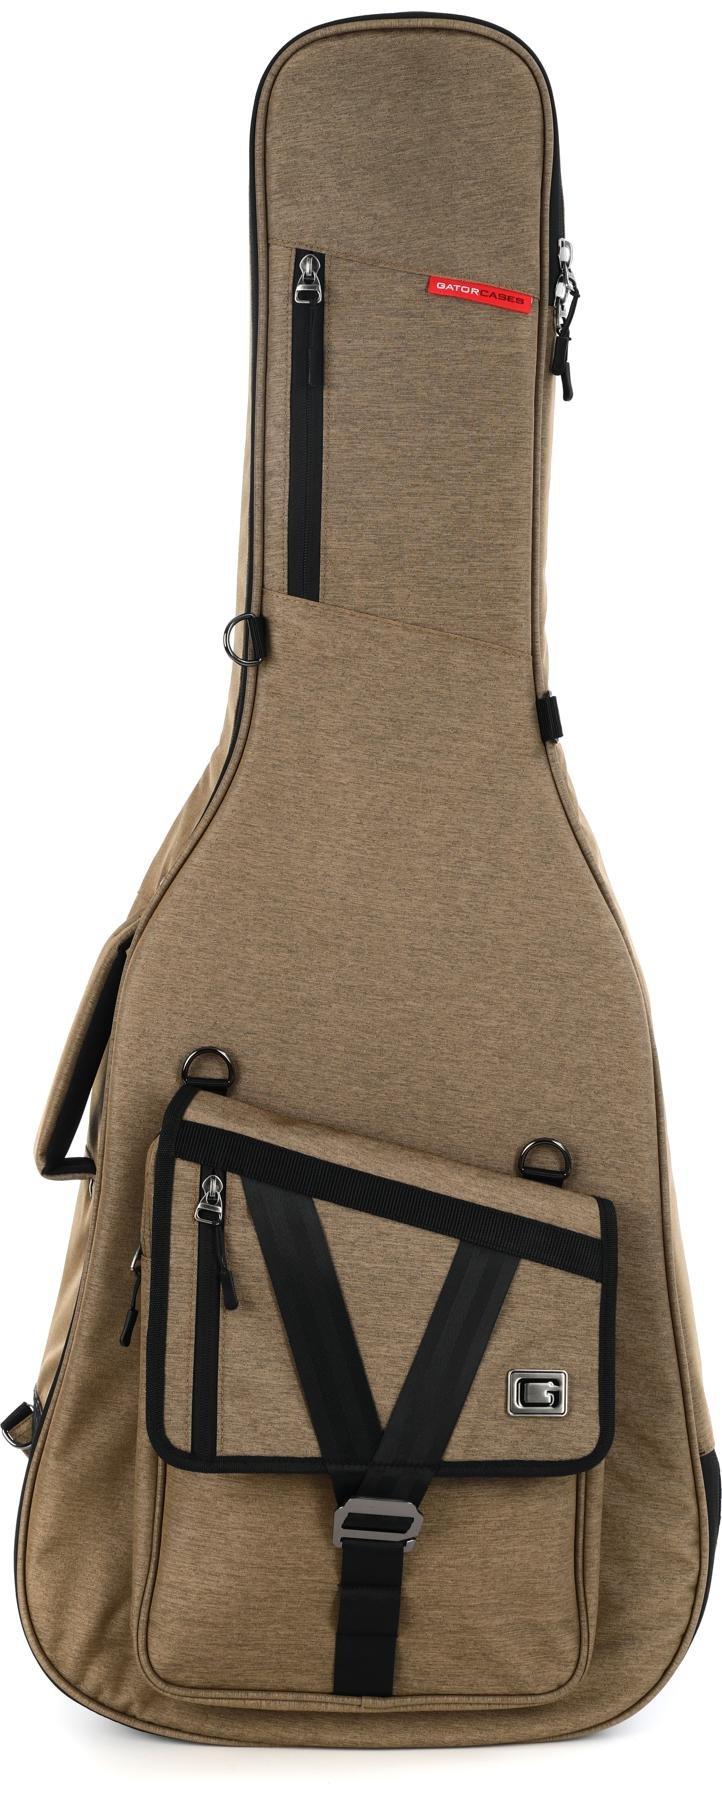 Gator Transit Series Acoustic Guitar Bag Tan Image 1